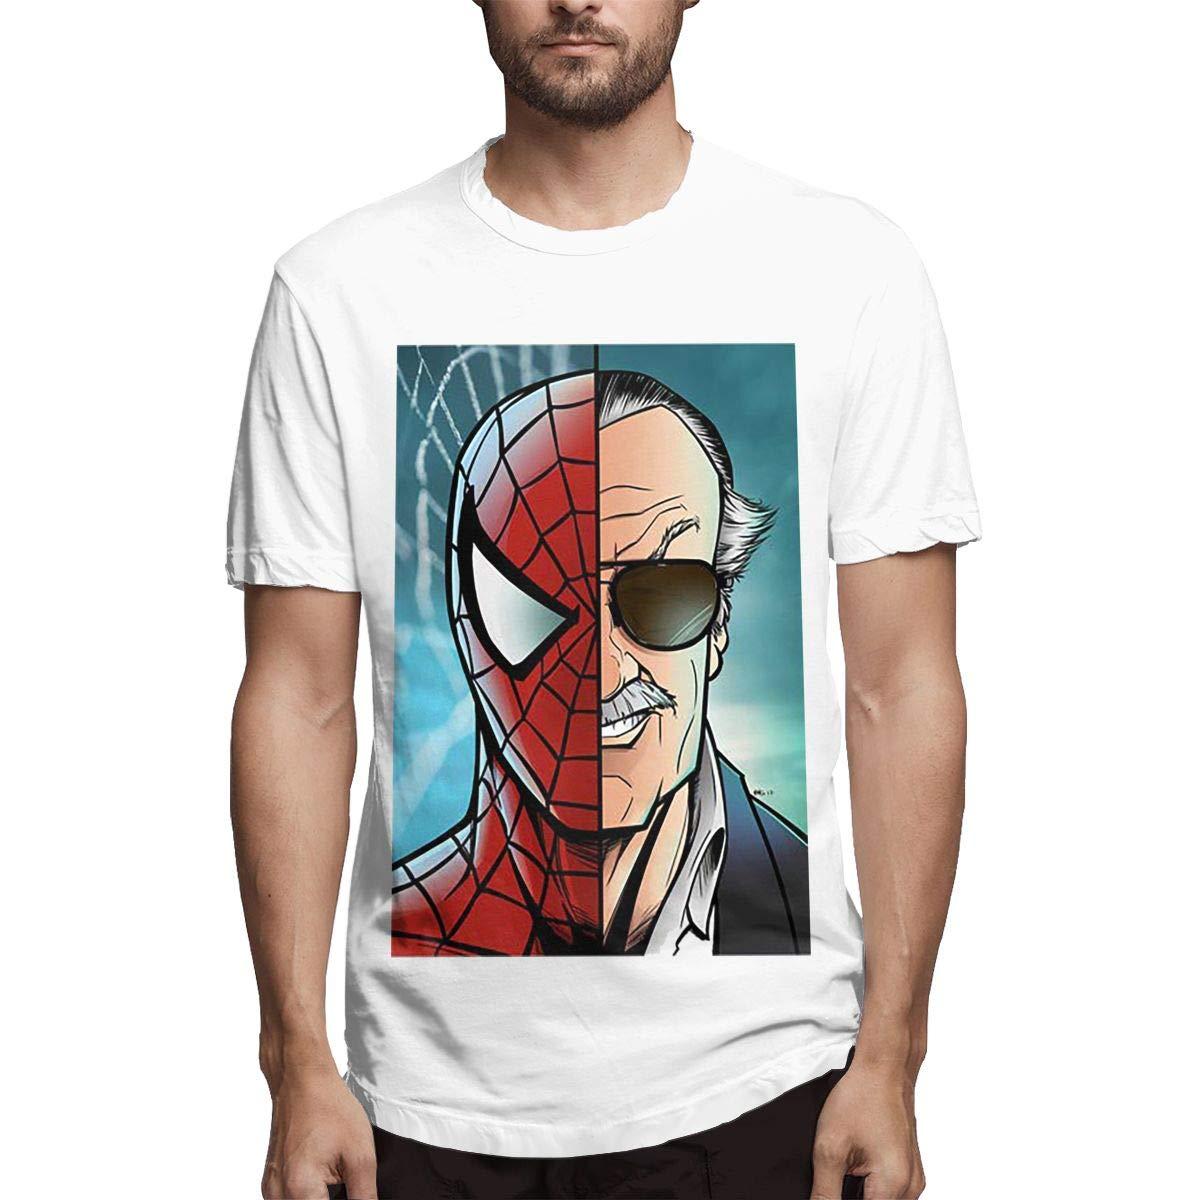 Ploewvgtee Stan Lee Marvel L Shirts